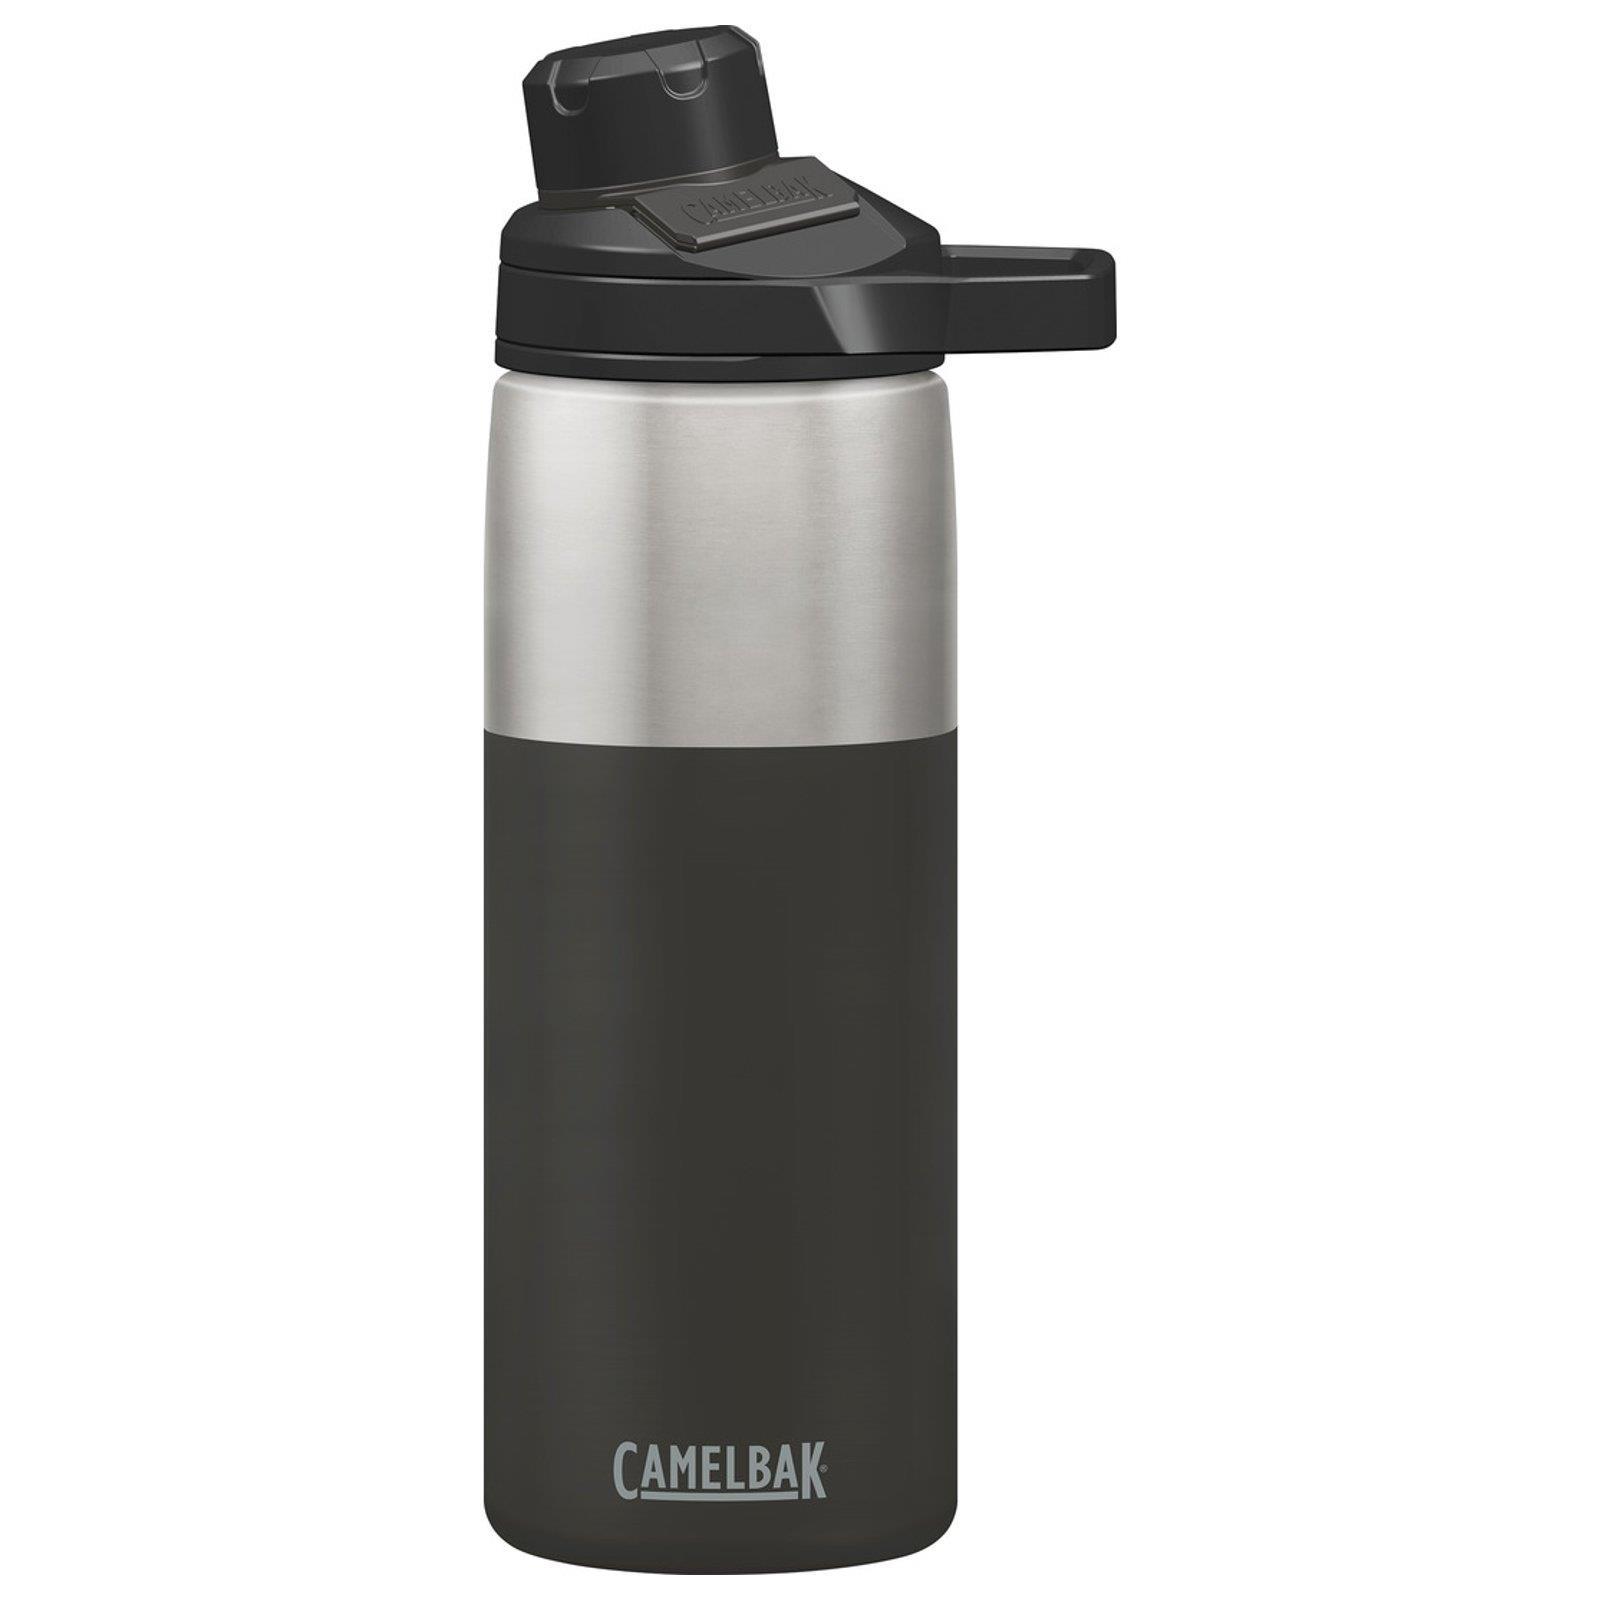 CAMELBAK Bouteille Chute aime Vacuum Fermeture Magnétique Eau Thermo Tasse Tasse Tasse 30add8